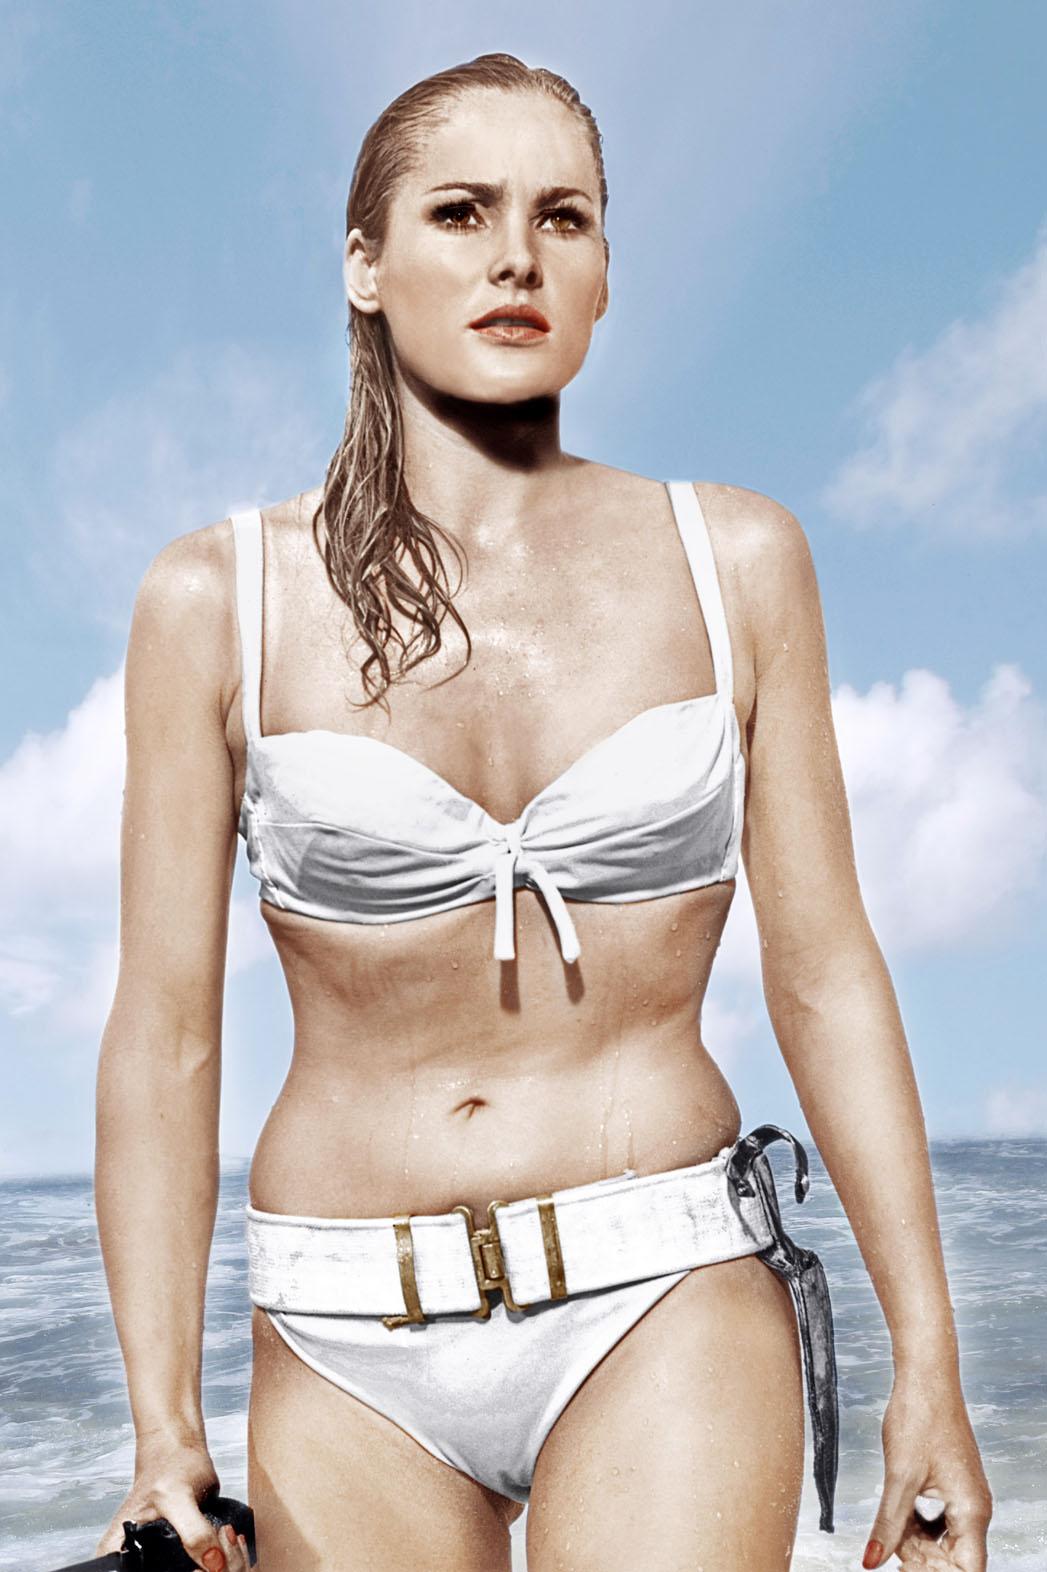 Swimsuit Naked Print One Piece Hairy Woman Swimwear Bathing Suit Beachwear